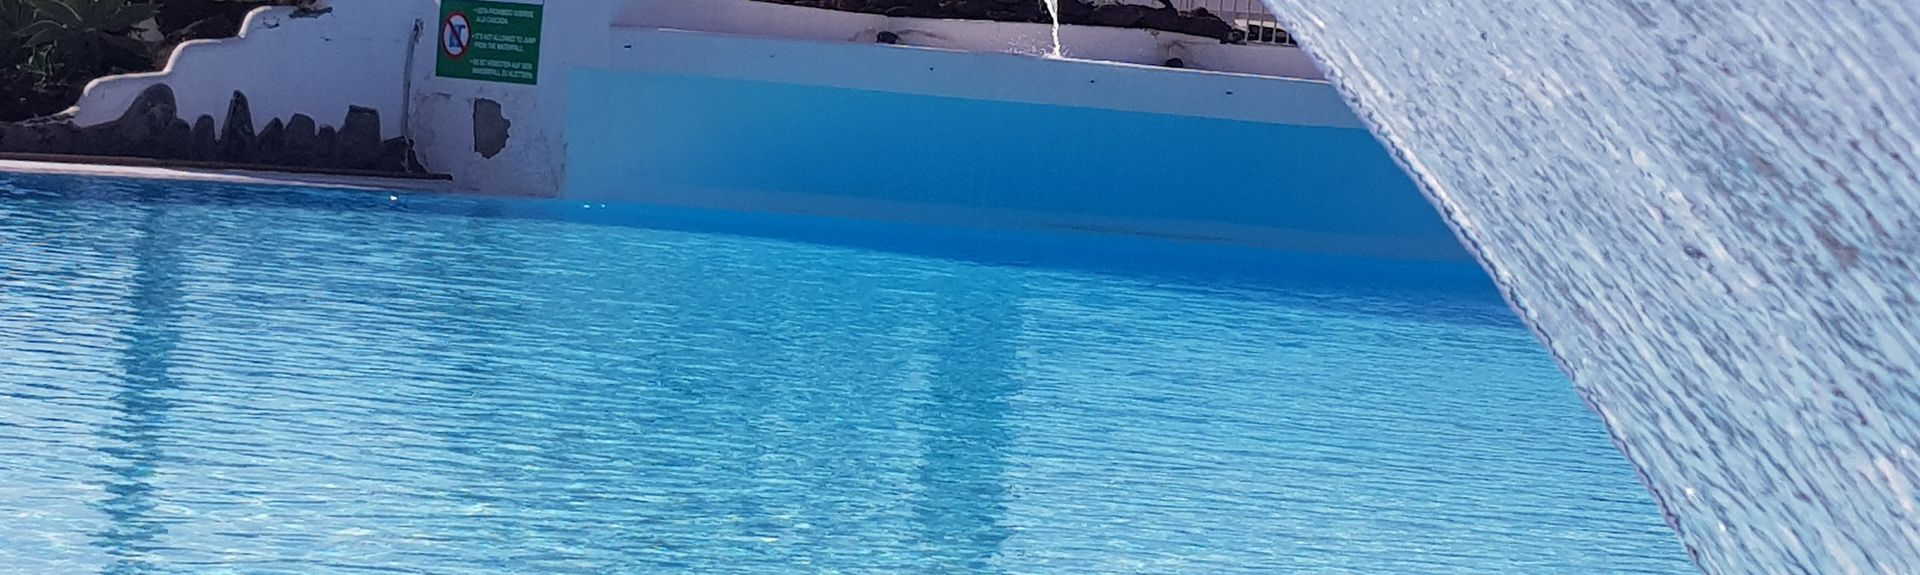 Bahía Feliz, San Bartolome de Tirajana, Kanariansaaret, Espanja